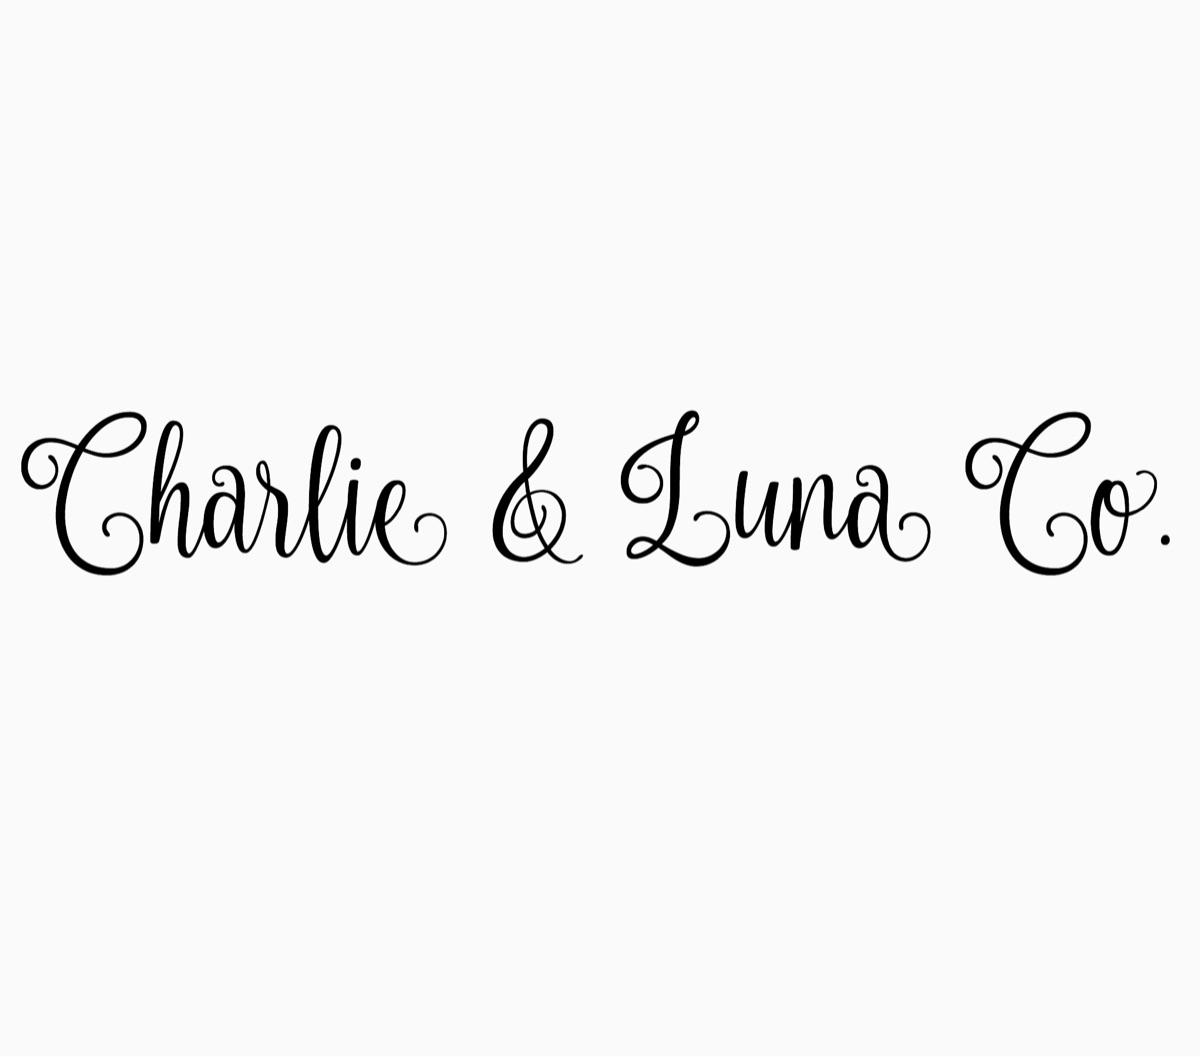 Charlie & Luna Co. - Alanah (@charlieandlunaco) Cover Image